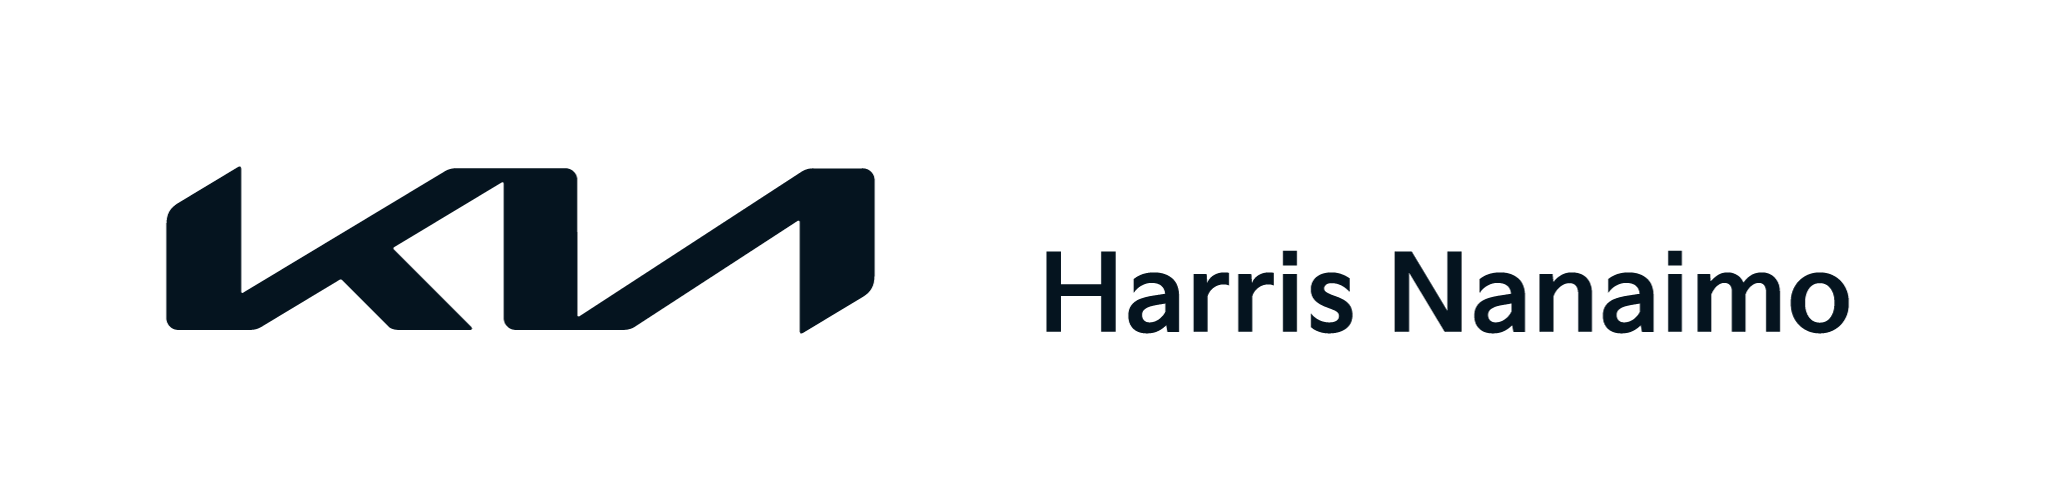 Kia Harris Nanimo logo